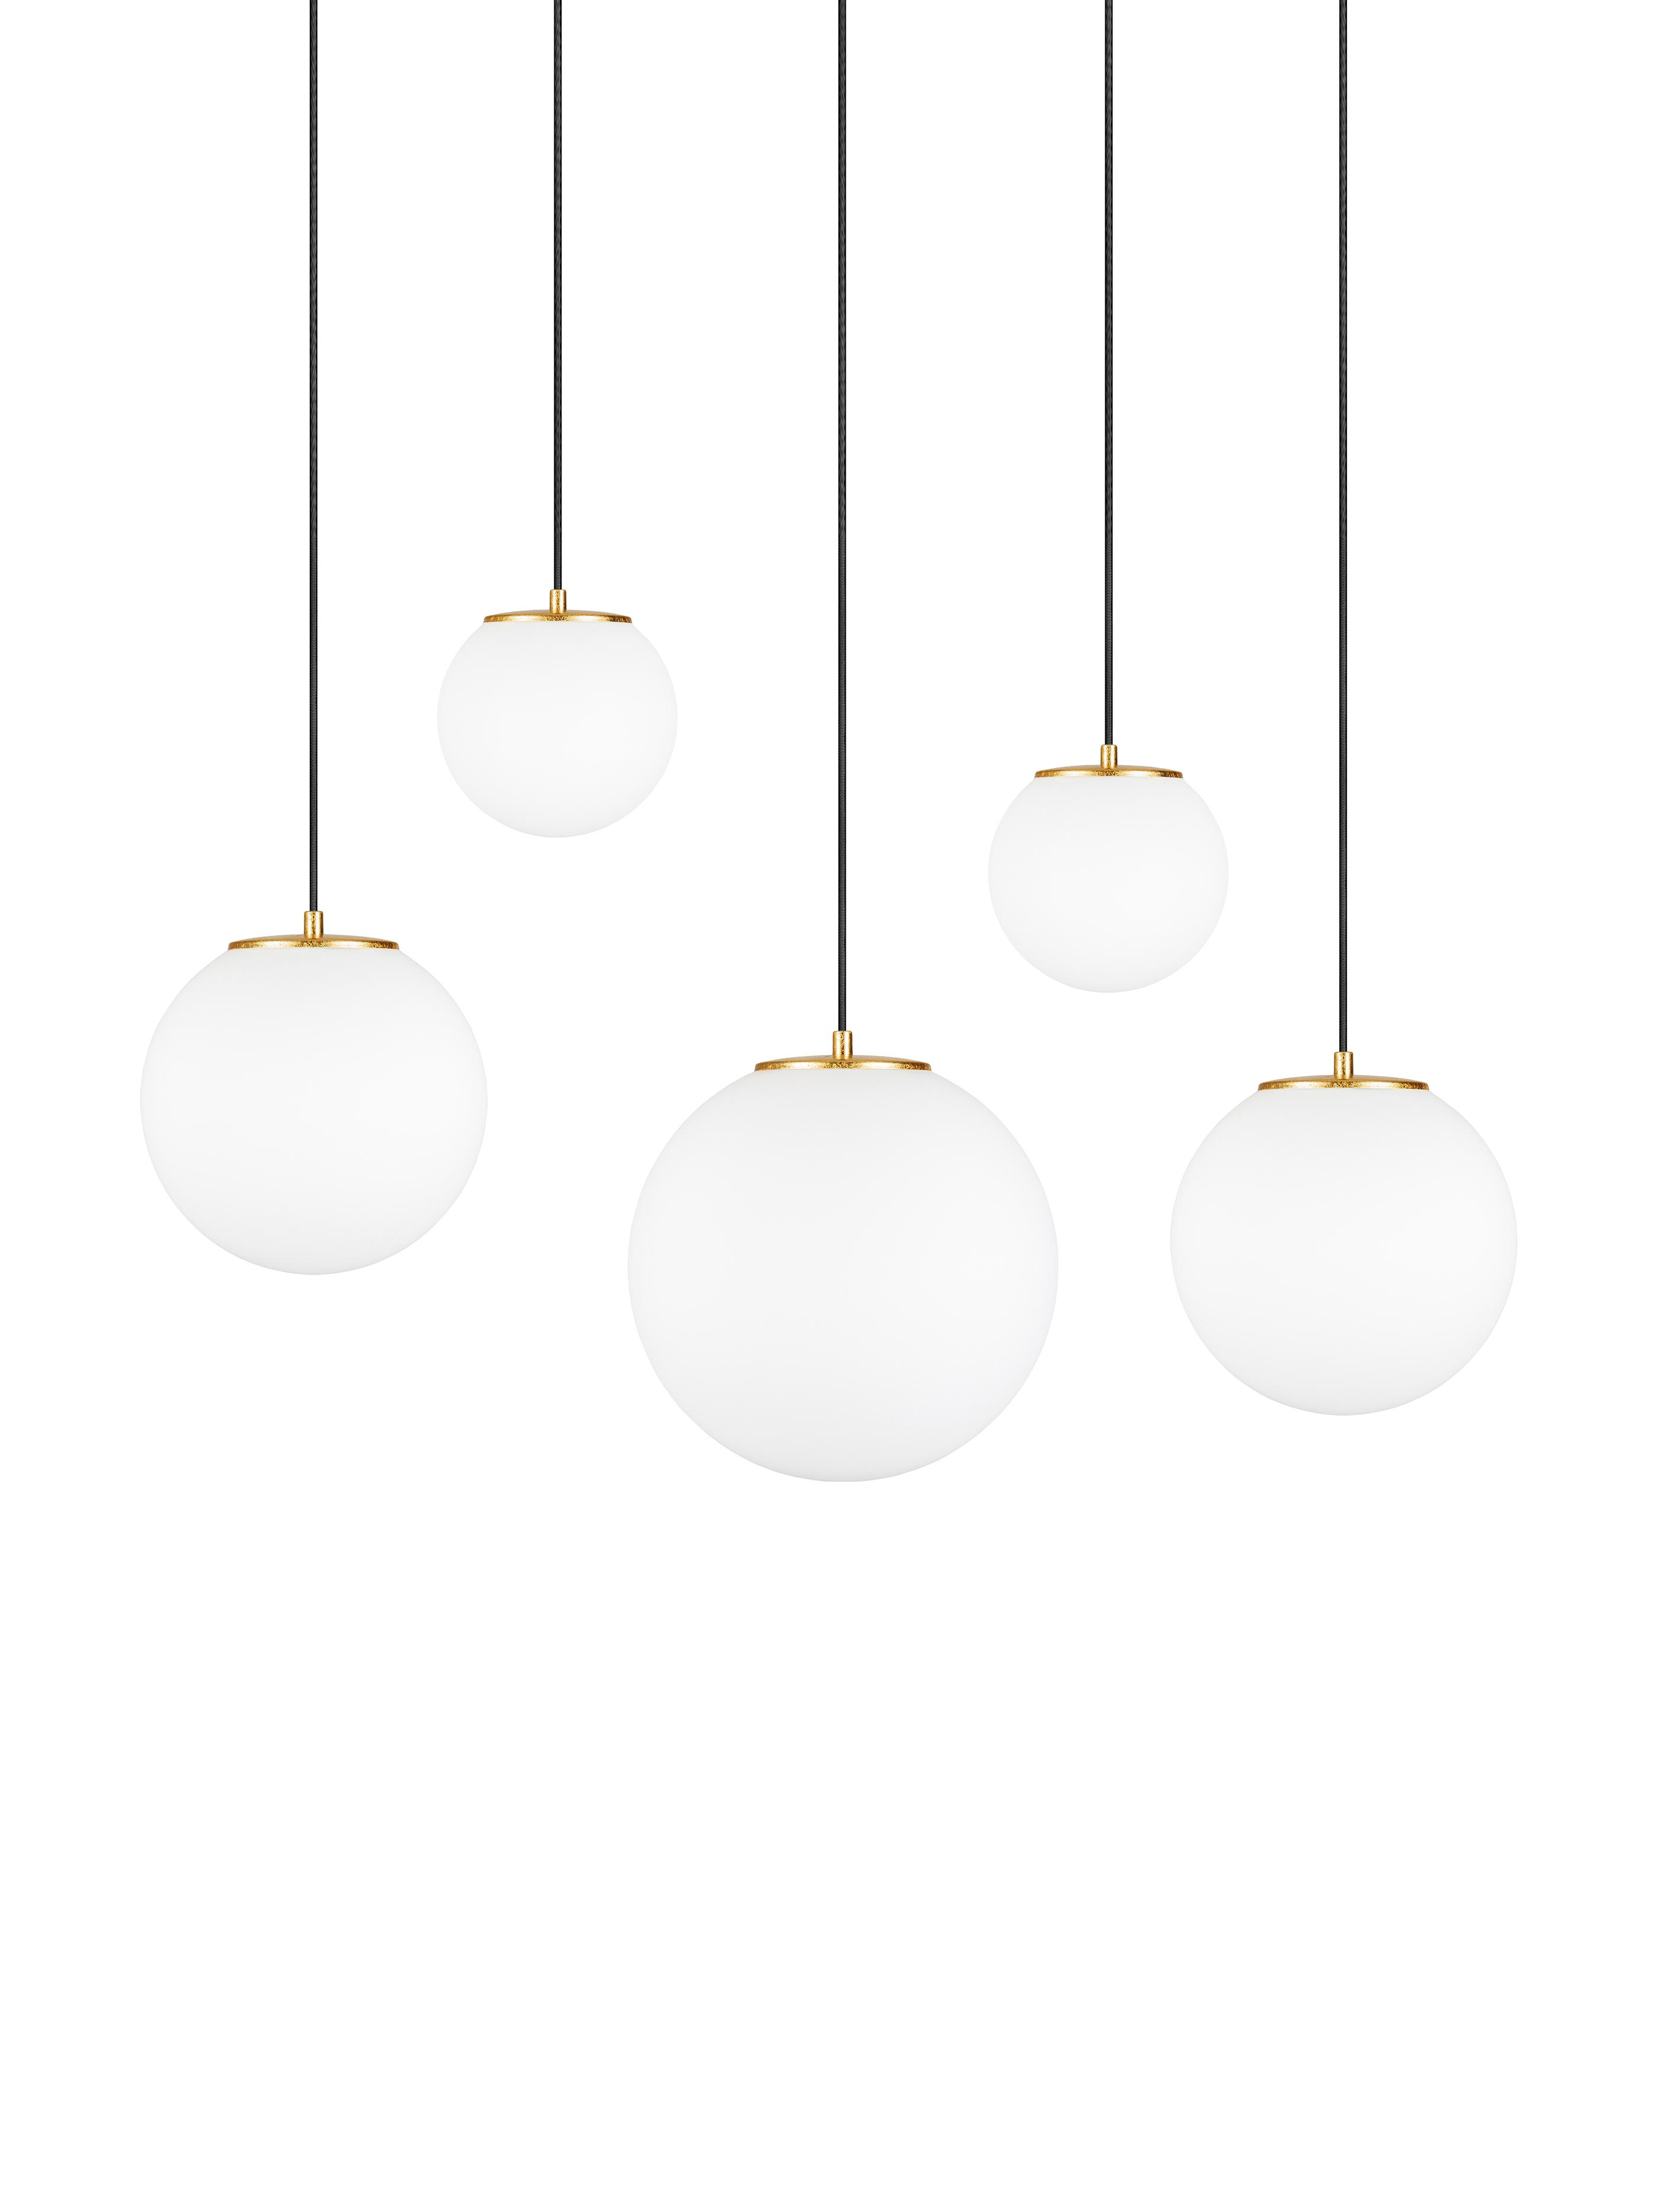 Hanglamp  met bollen Tsuki van opaalglas, Lampenkap: opaalglas, Opaalwit, zwart, messingkleurig, 95 x 166 cm